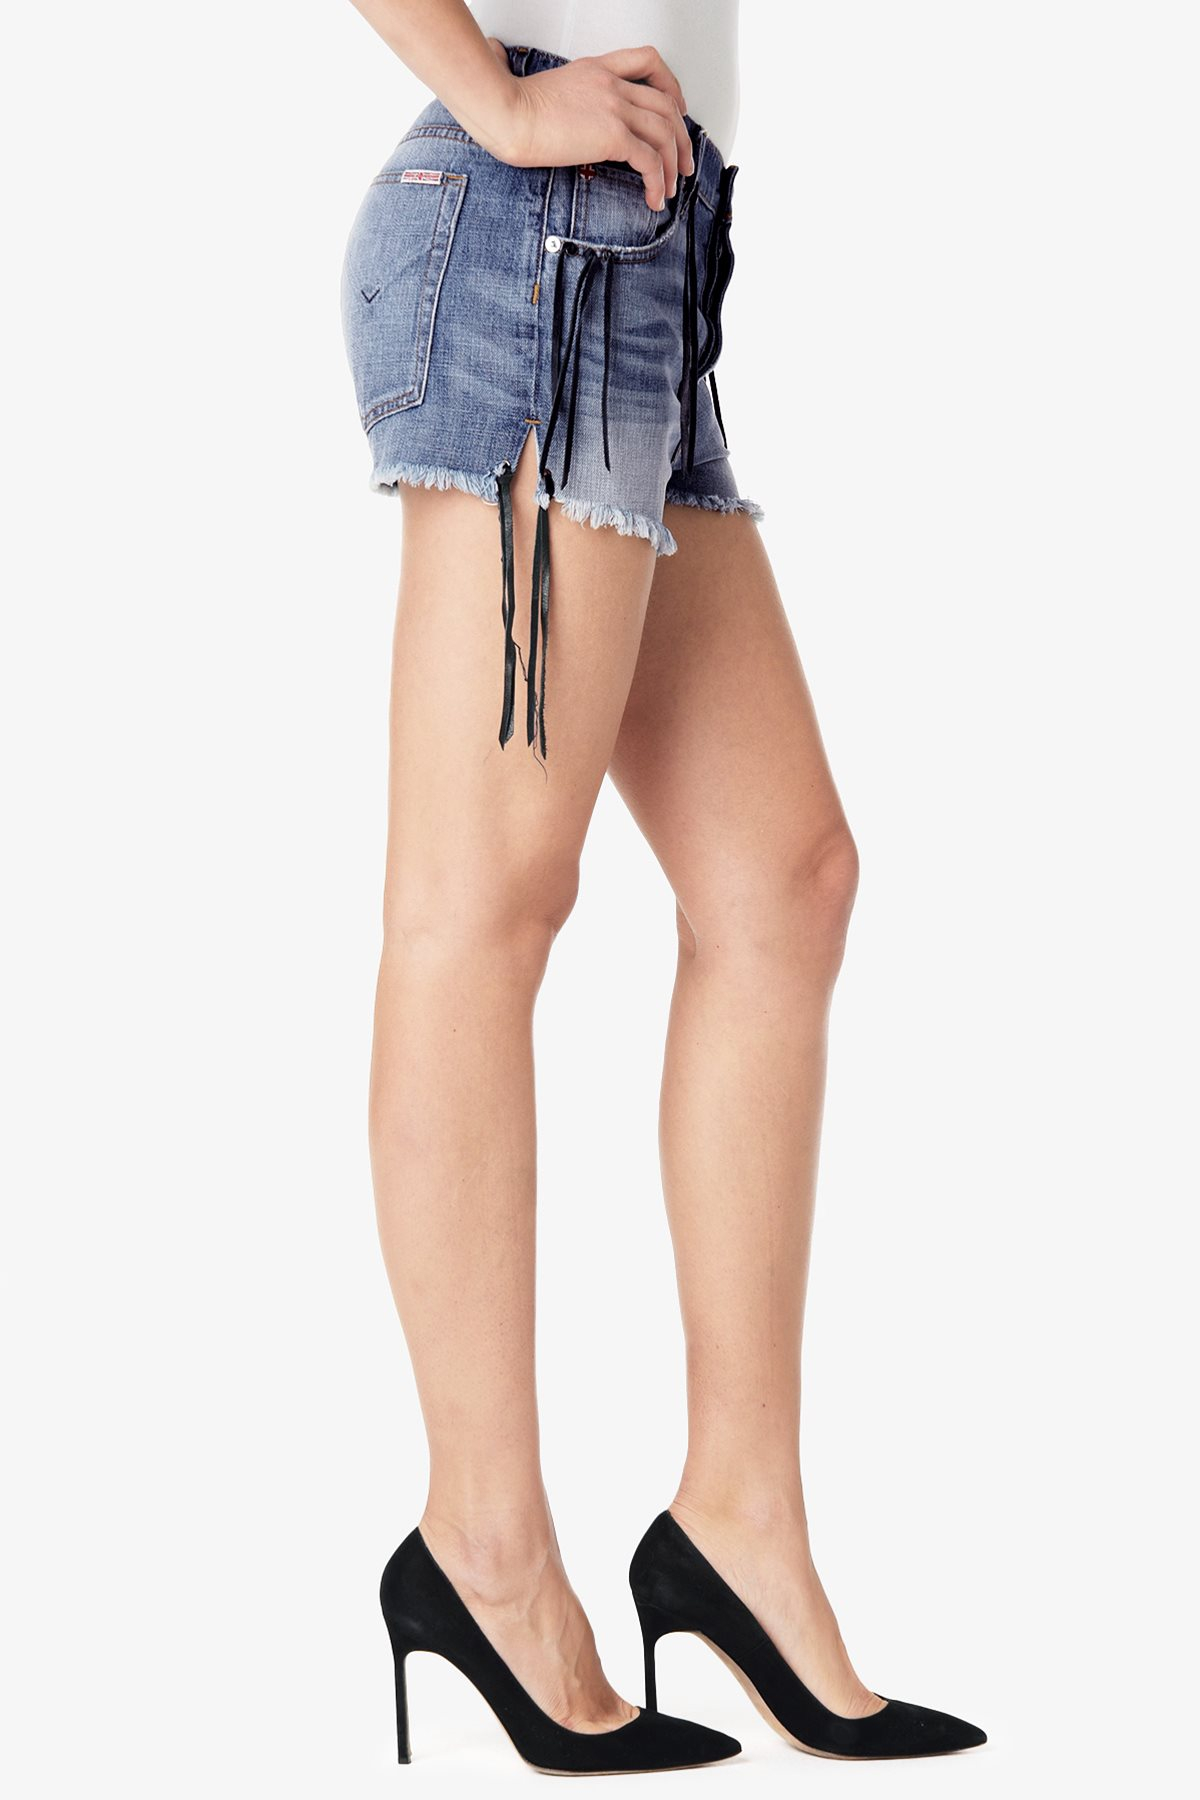 Hudson Jeans Tori Slouch Short In Blue Lyst